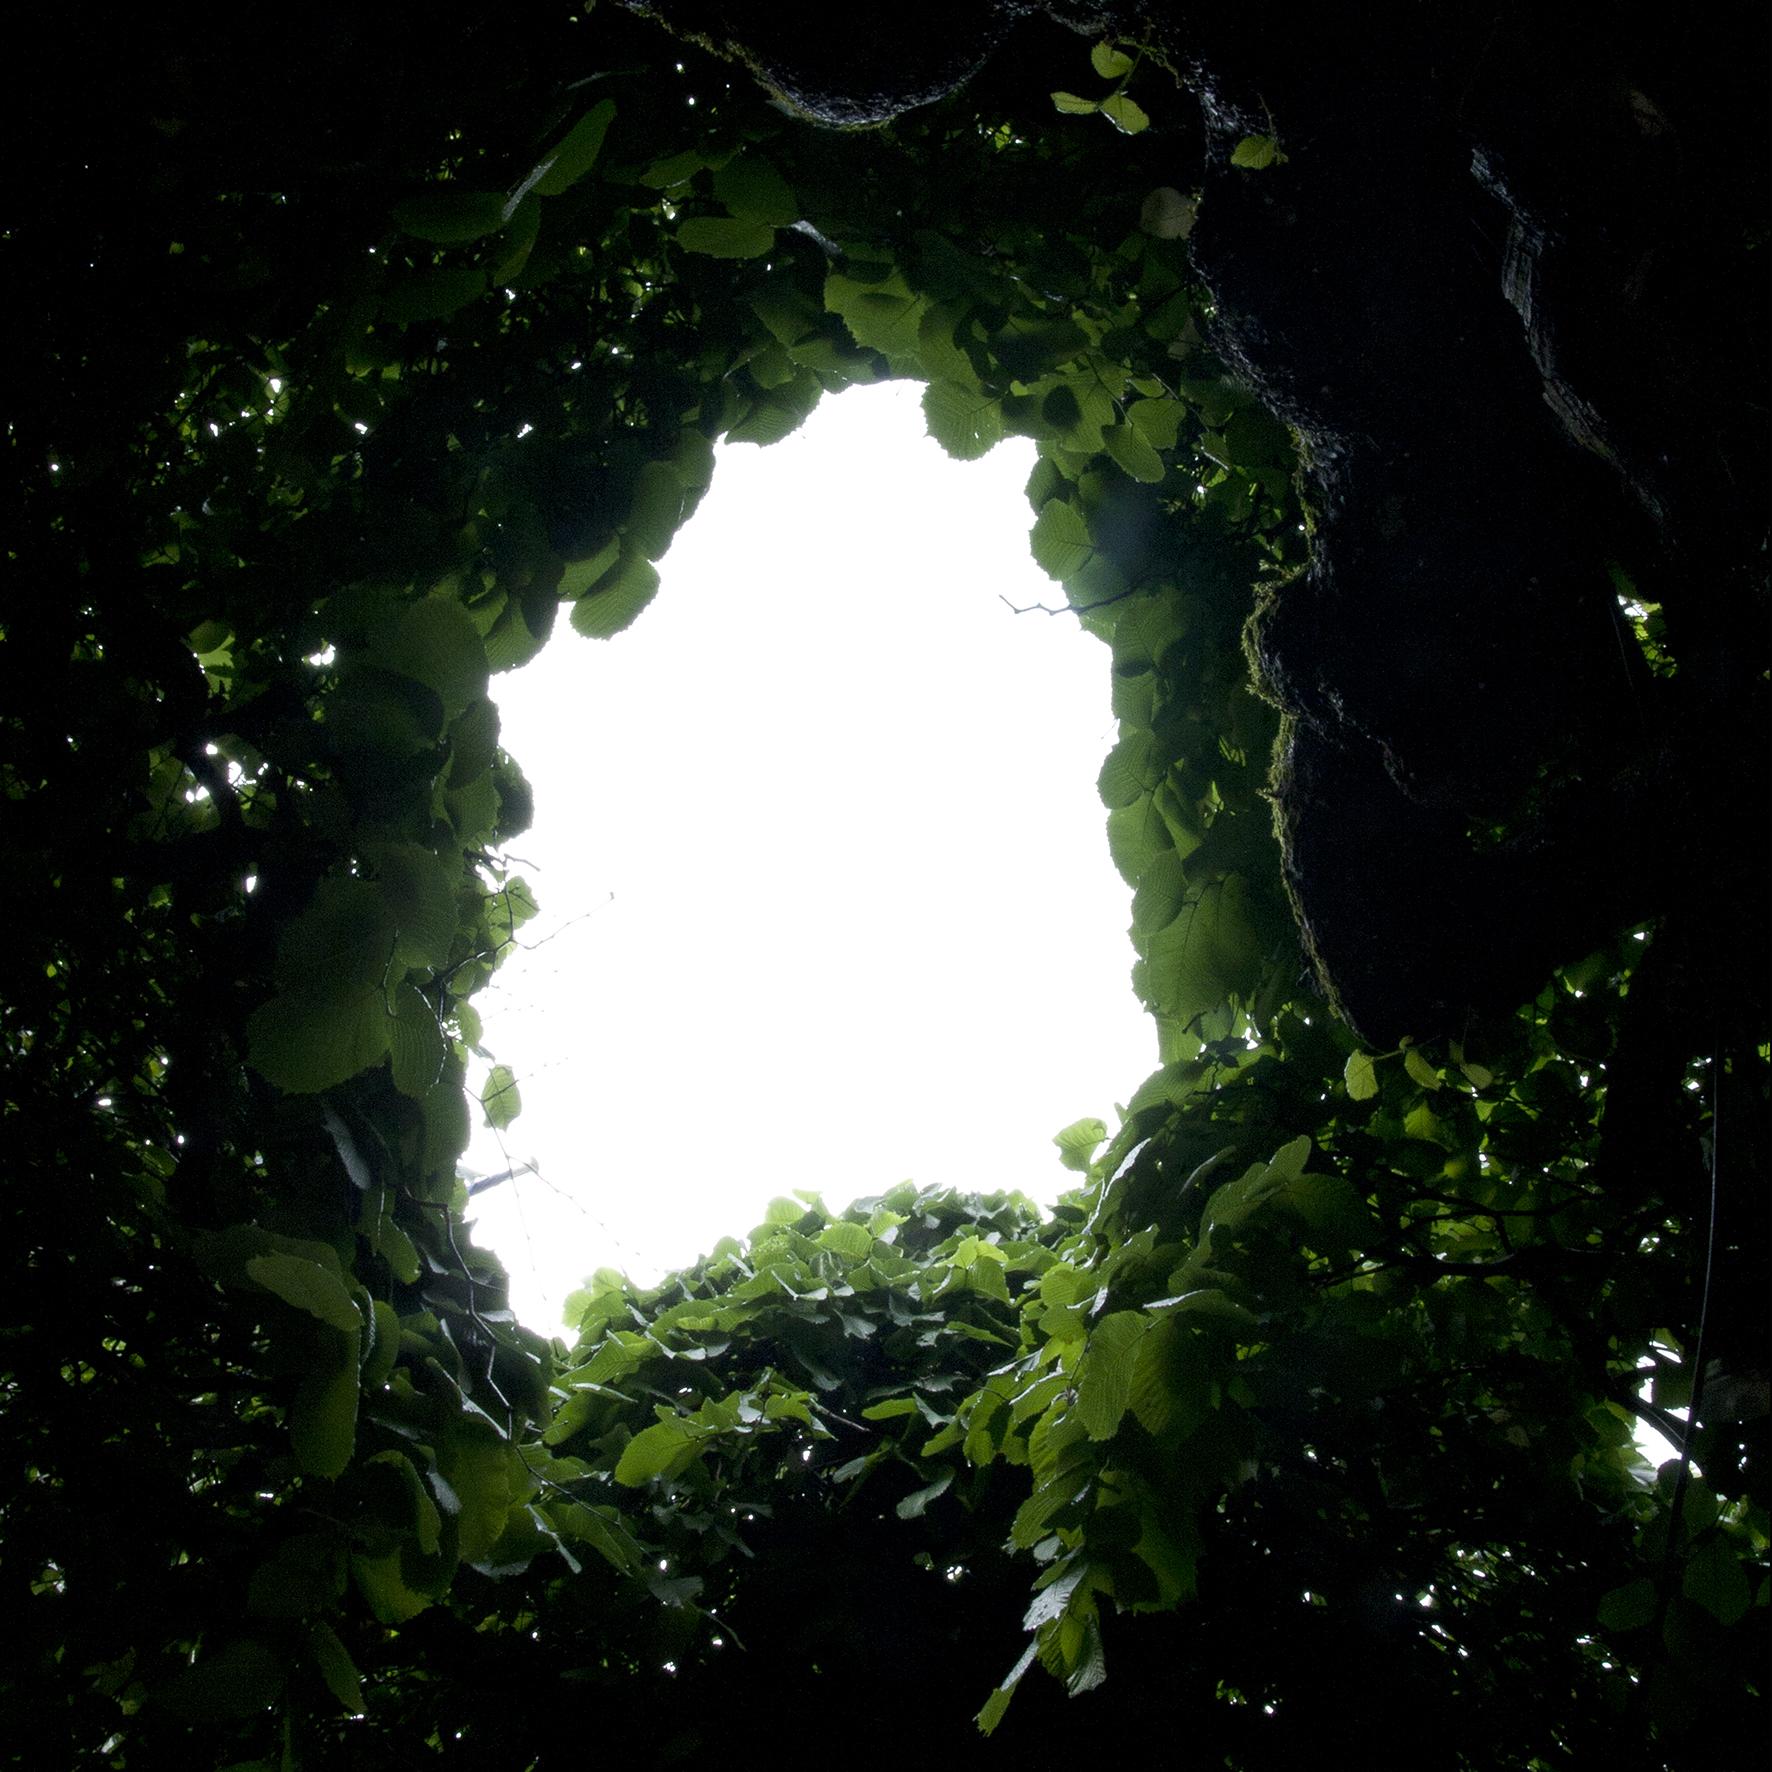 Maelle Collin_Hole_WEB.jpg